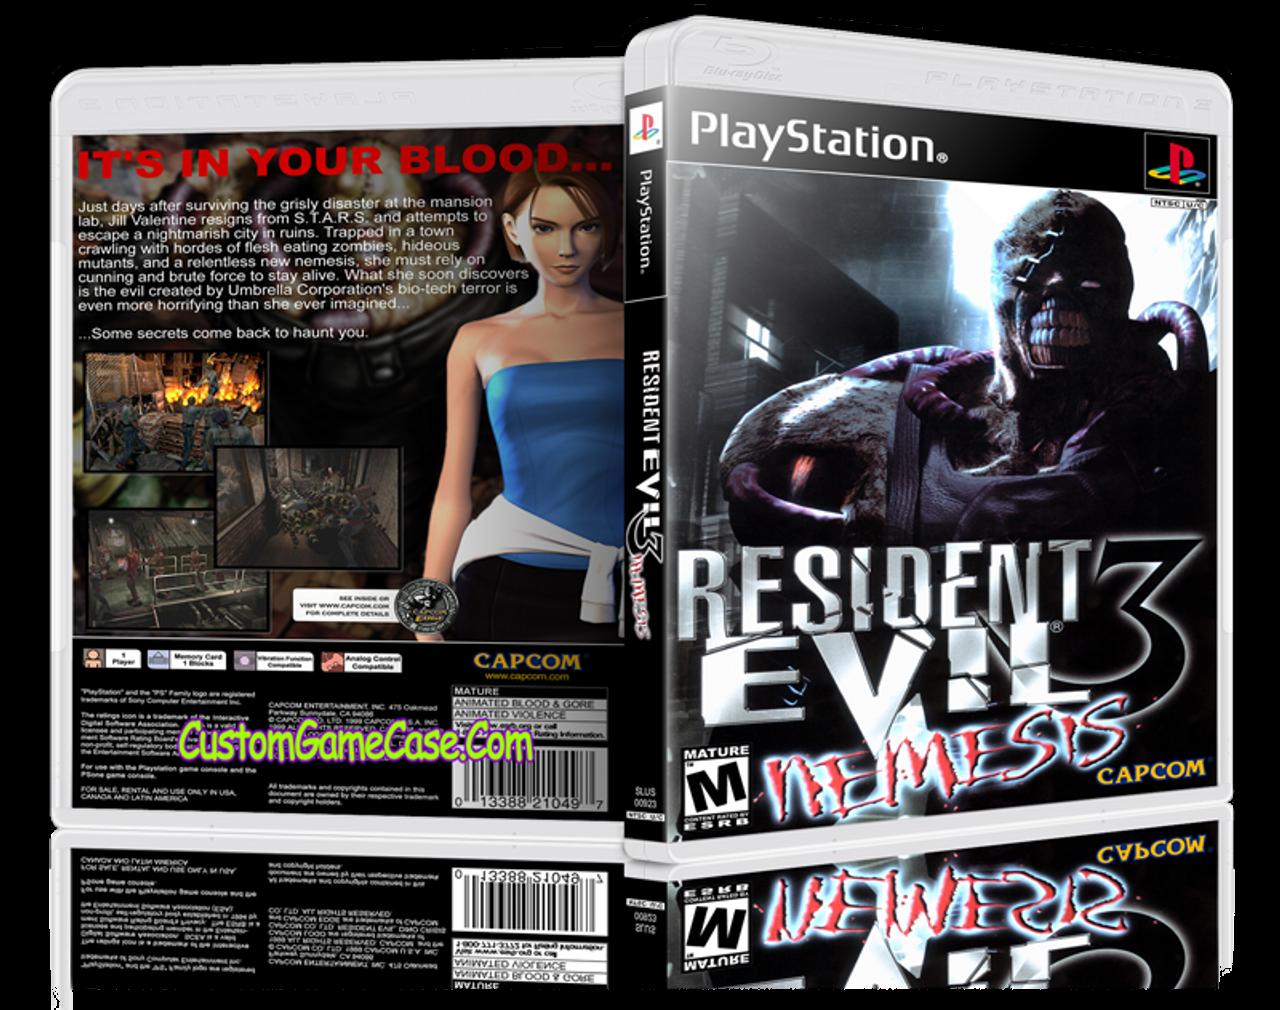 Resident Evil 3 Nemesis Sony Playstation 1 Psx Ps1 Empty